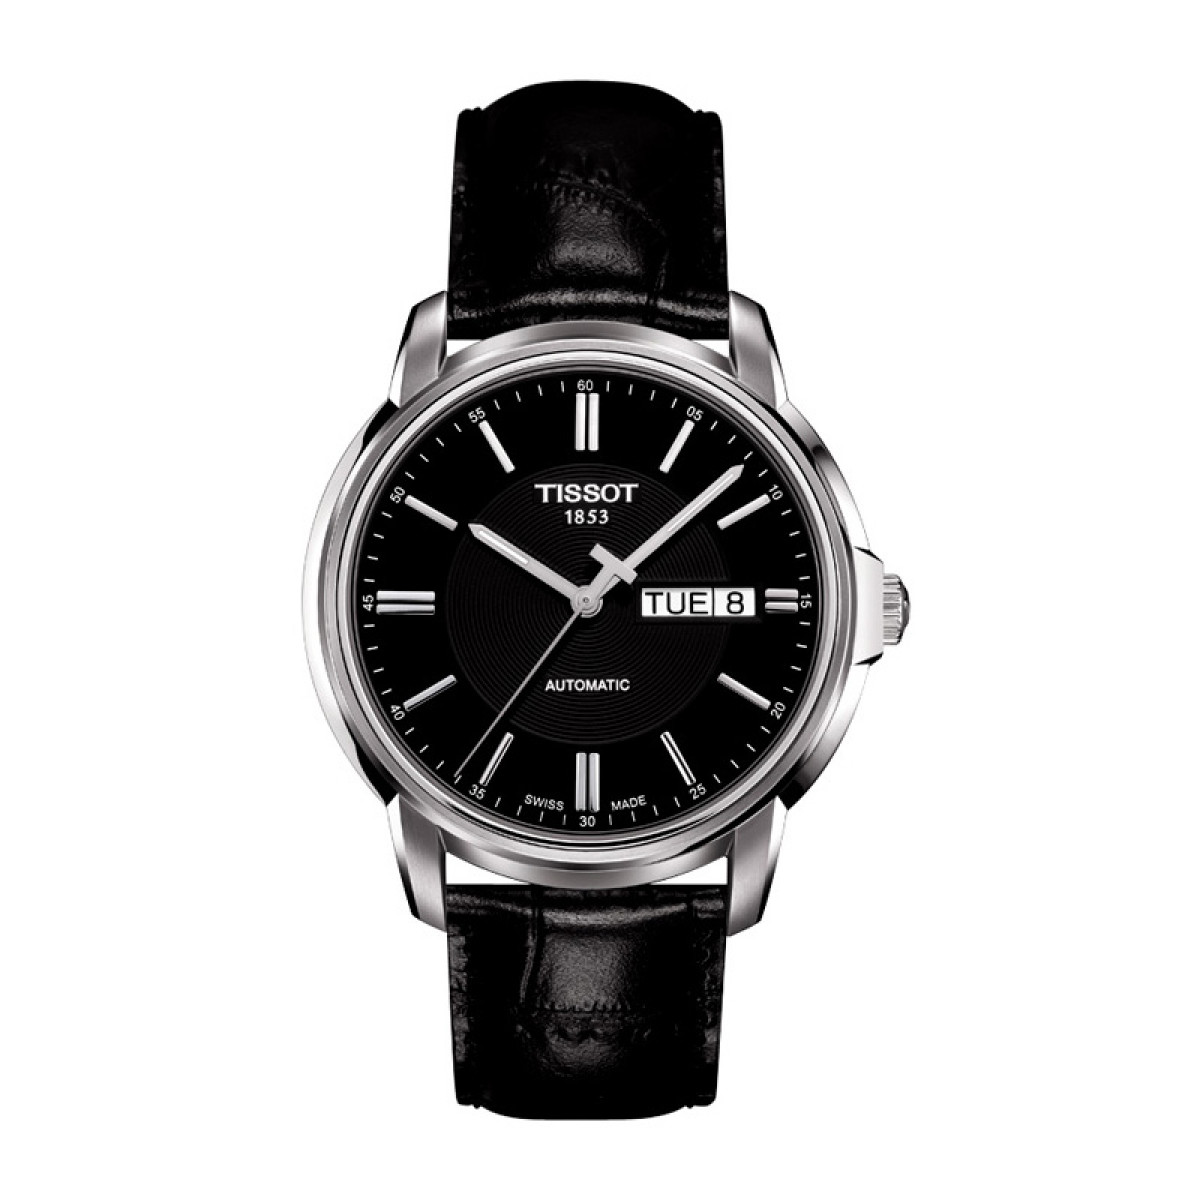 Часовник Tissot T065.430.16.051.00